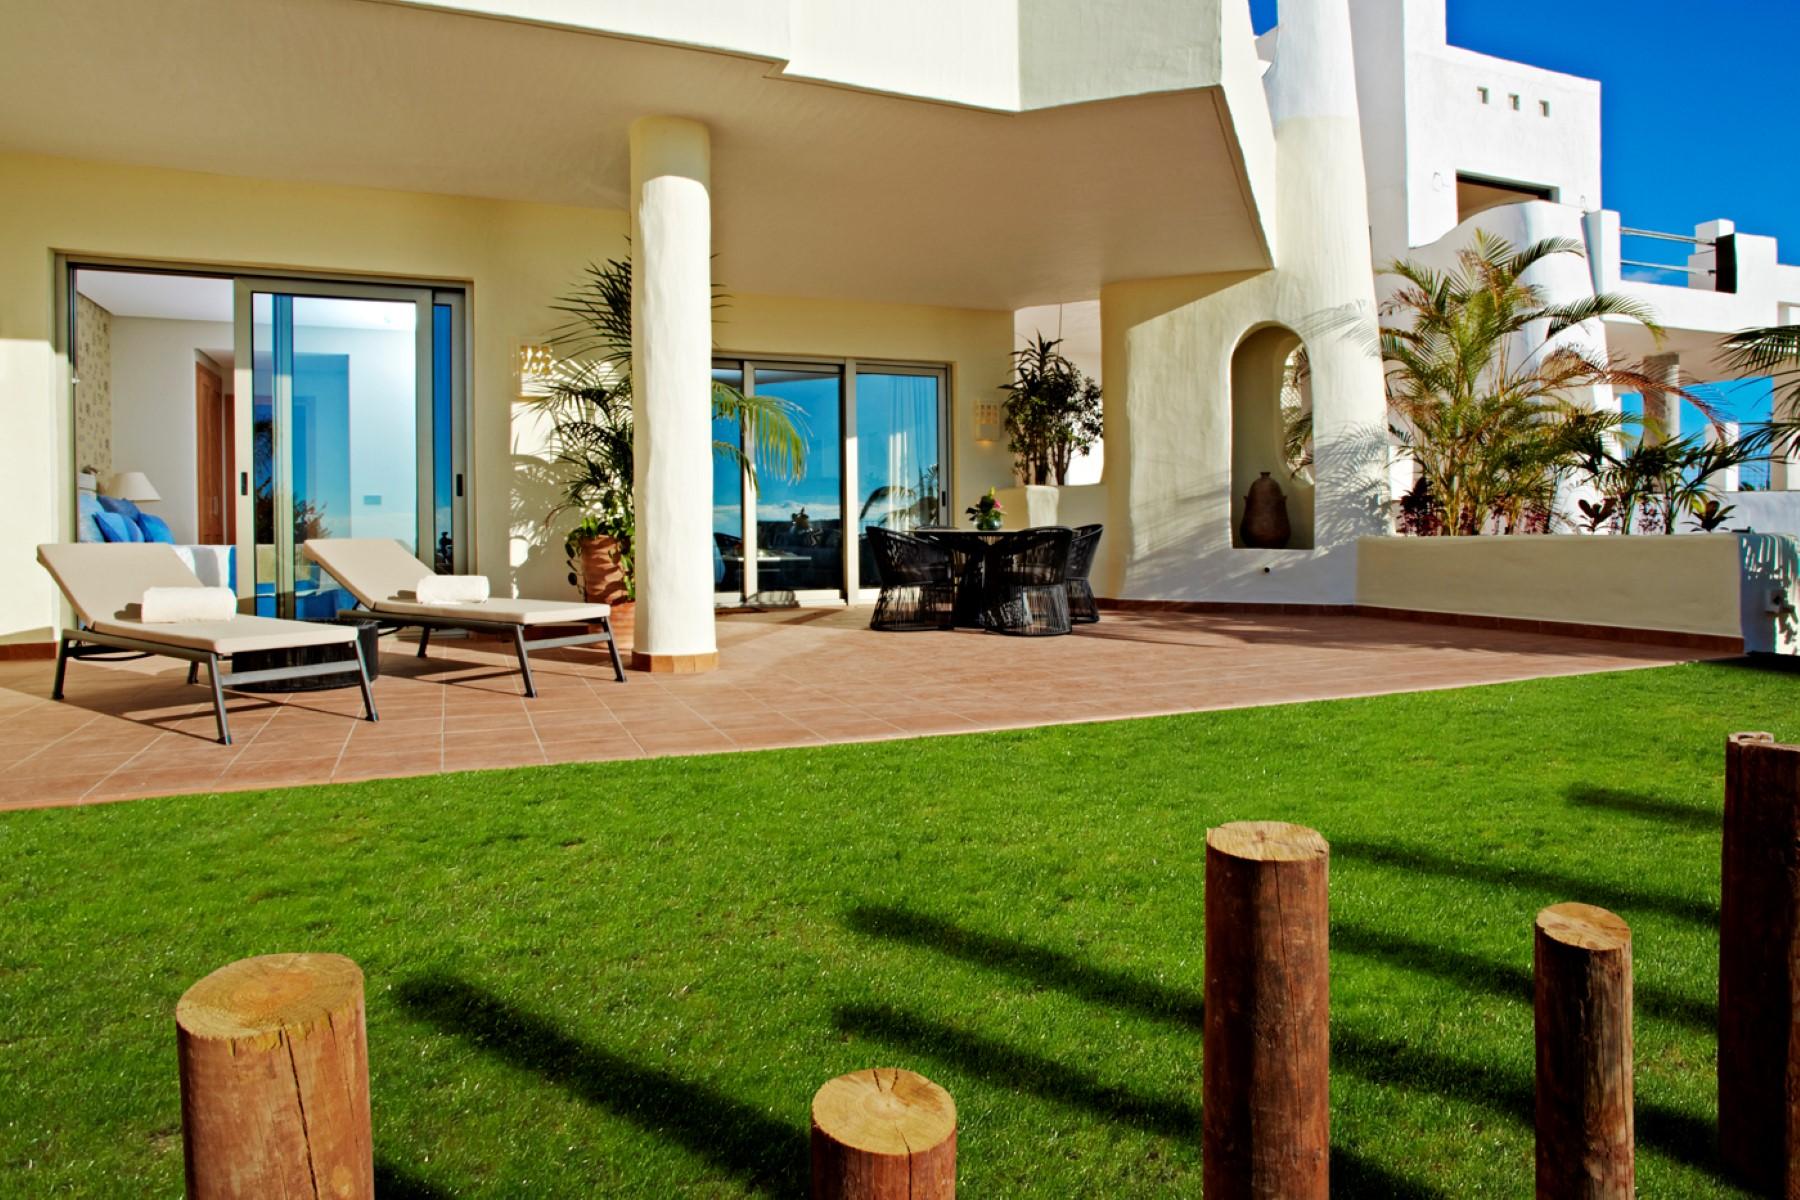 Apartment for Sale at Abama Terraces Abama Golf, Tenerife Canary Islands 38687 Spain